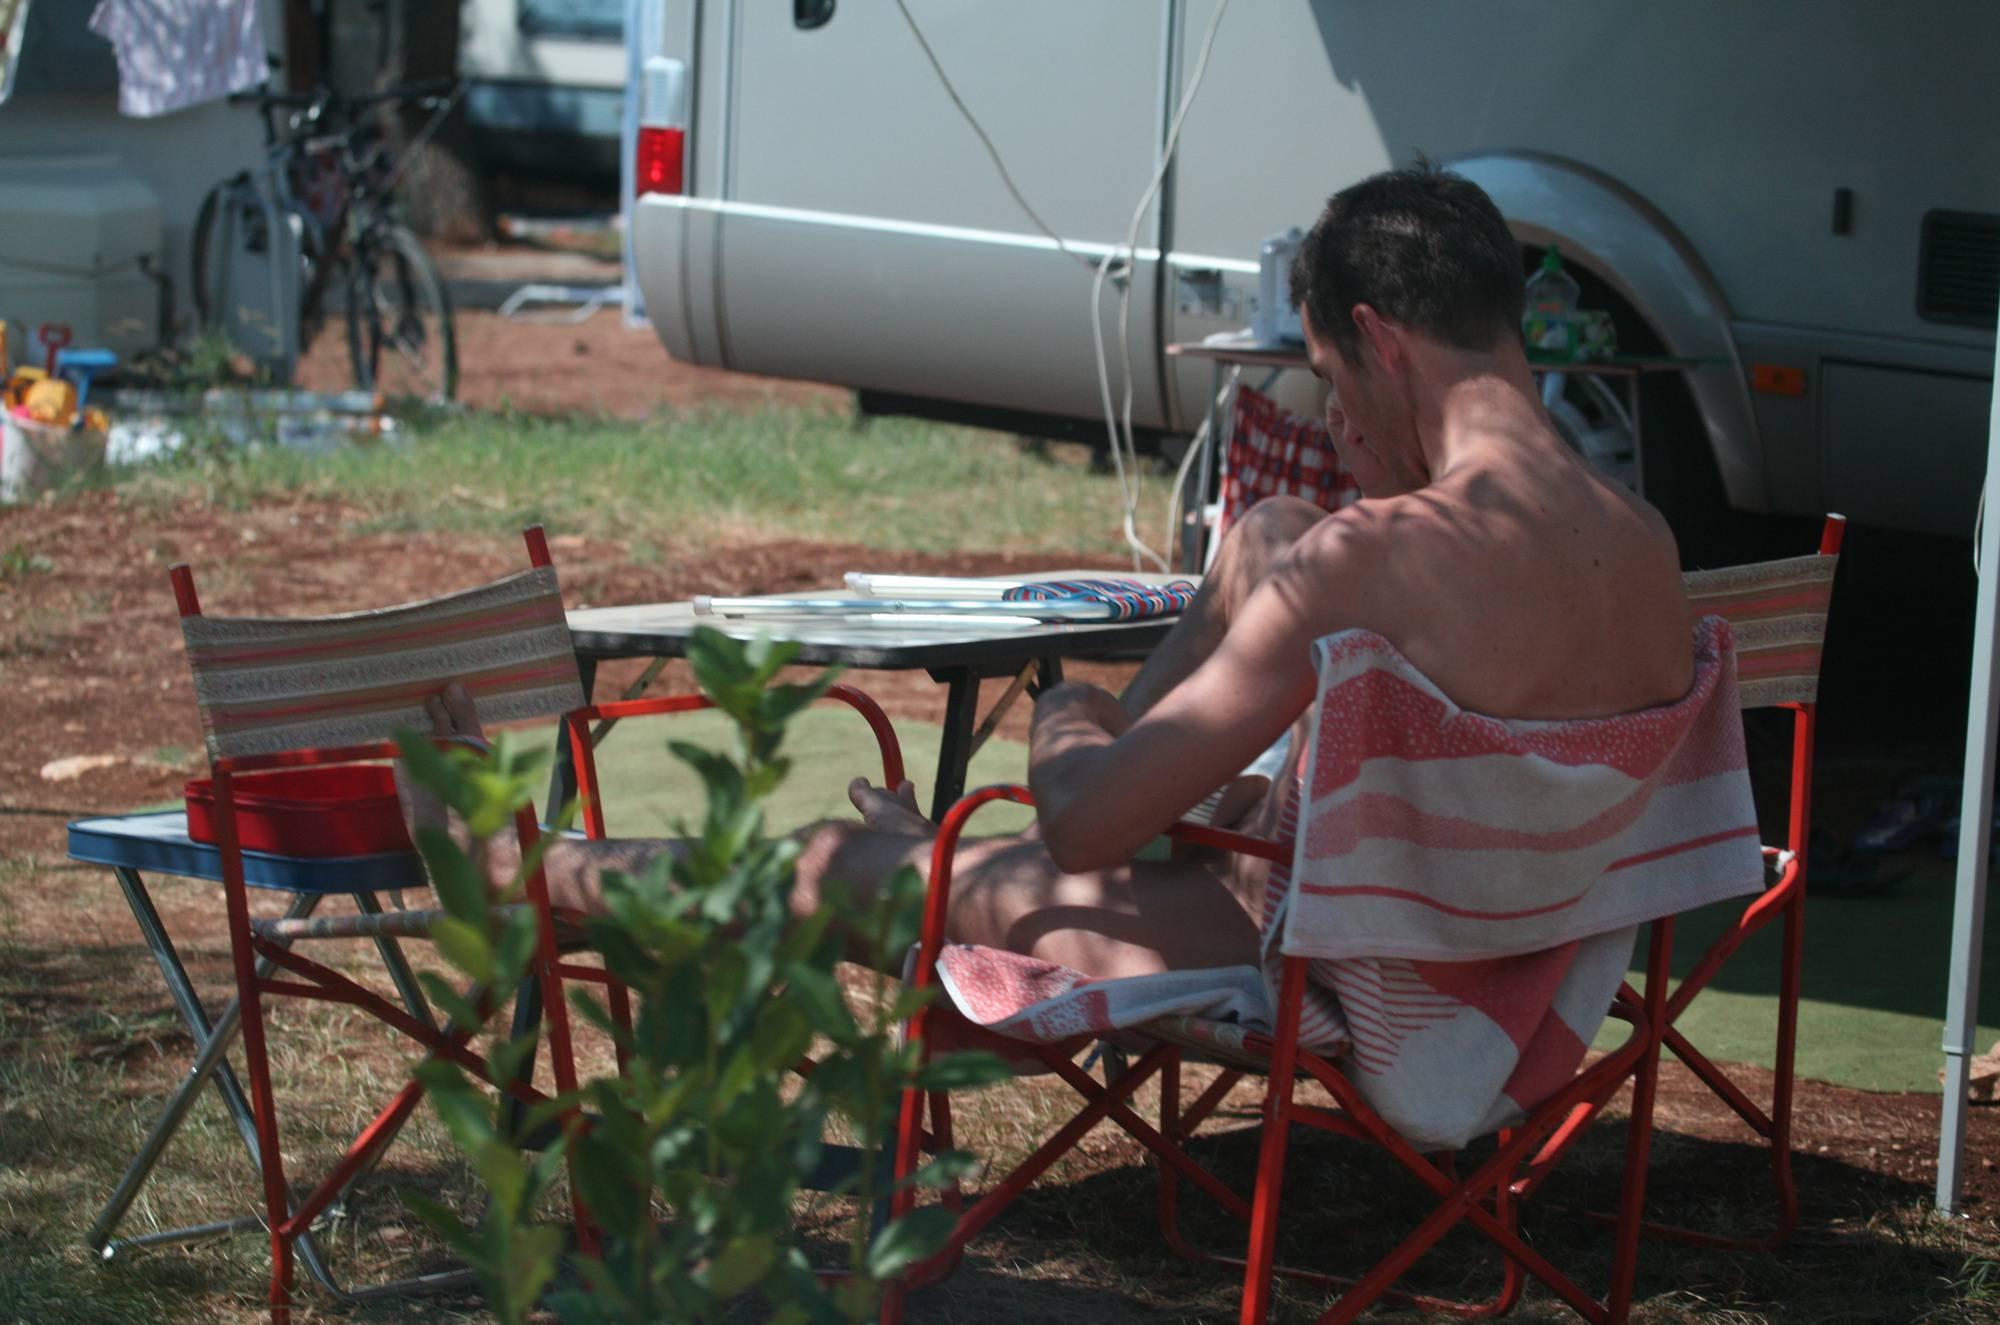 Nudist Gallery Pier Campground View - 1